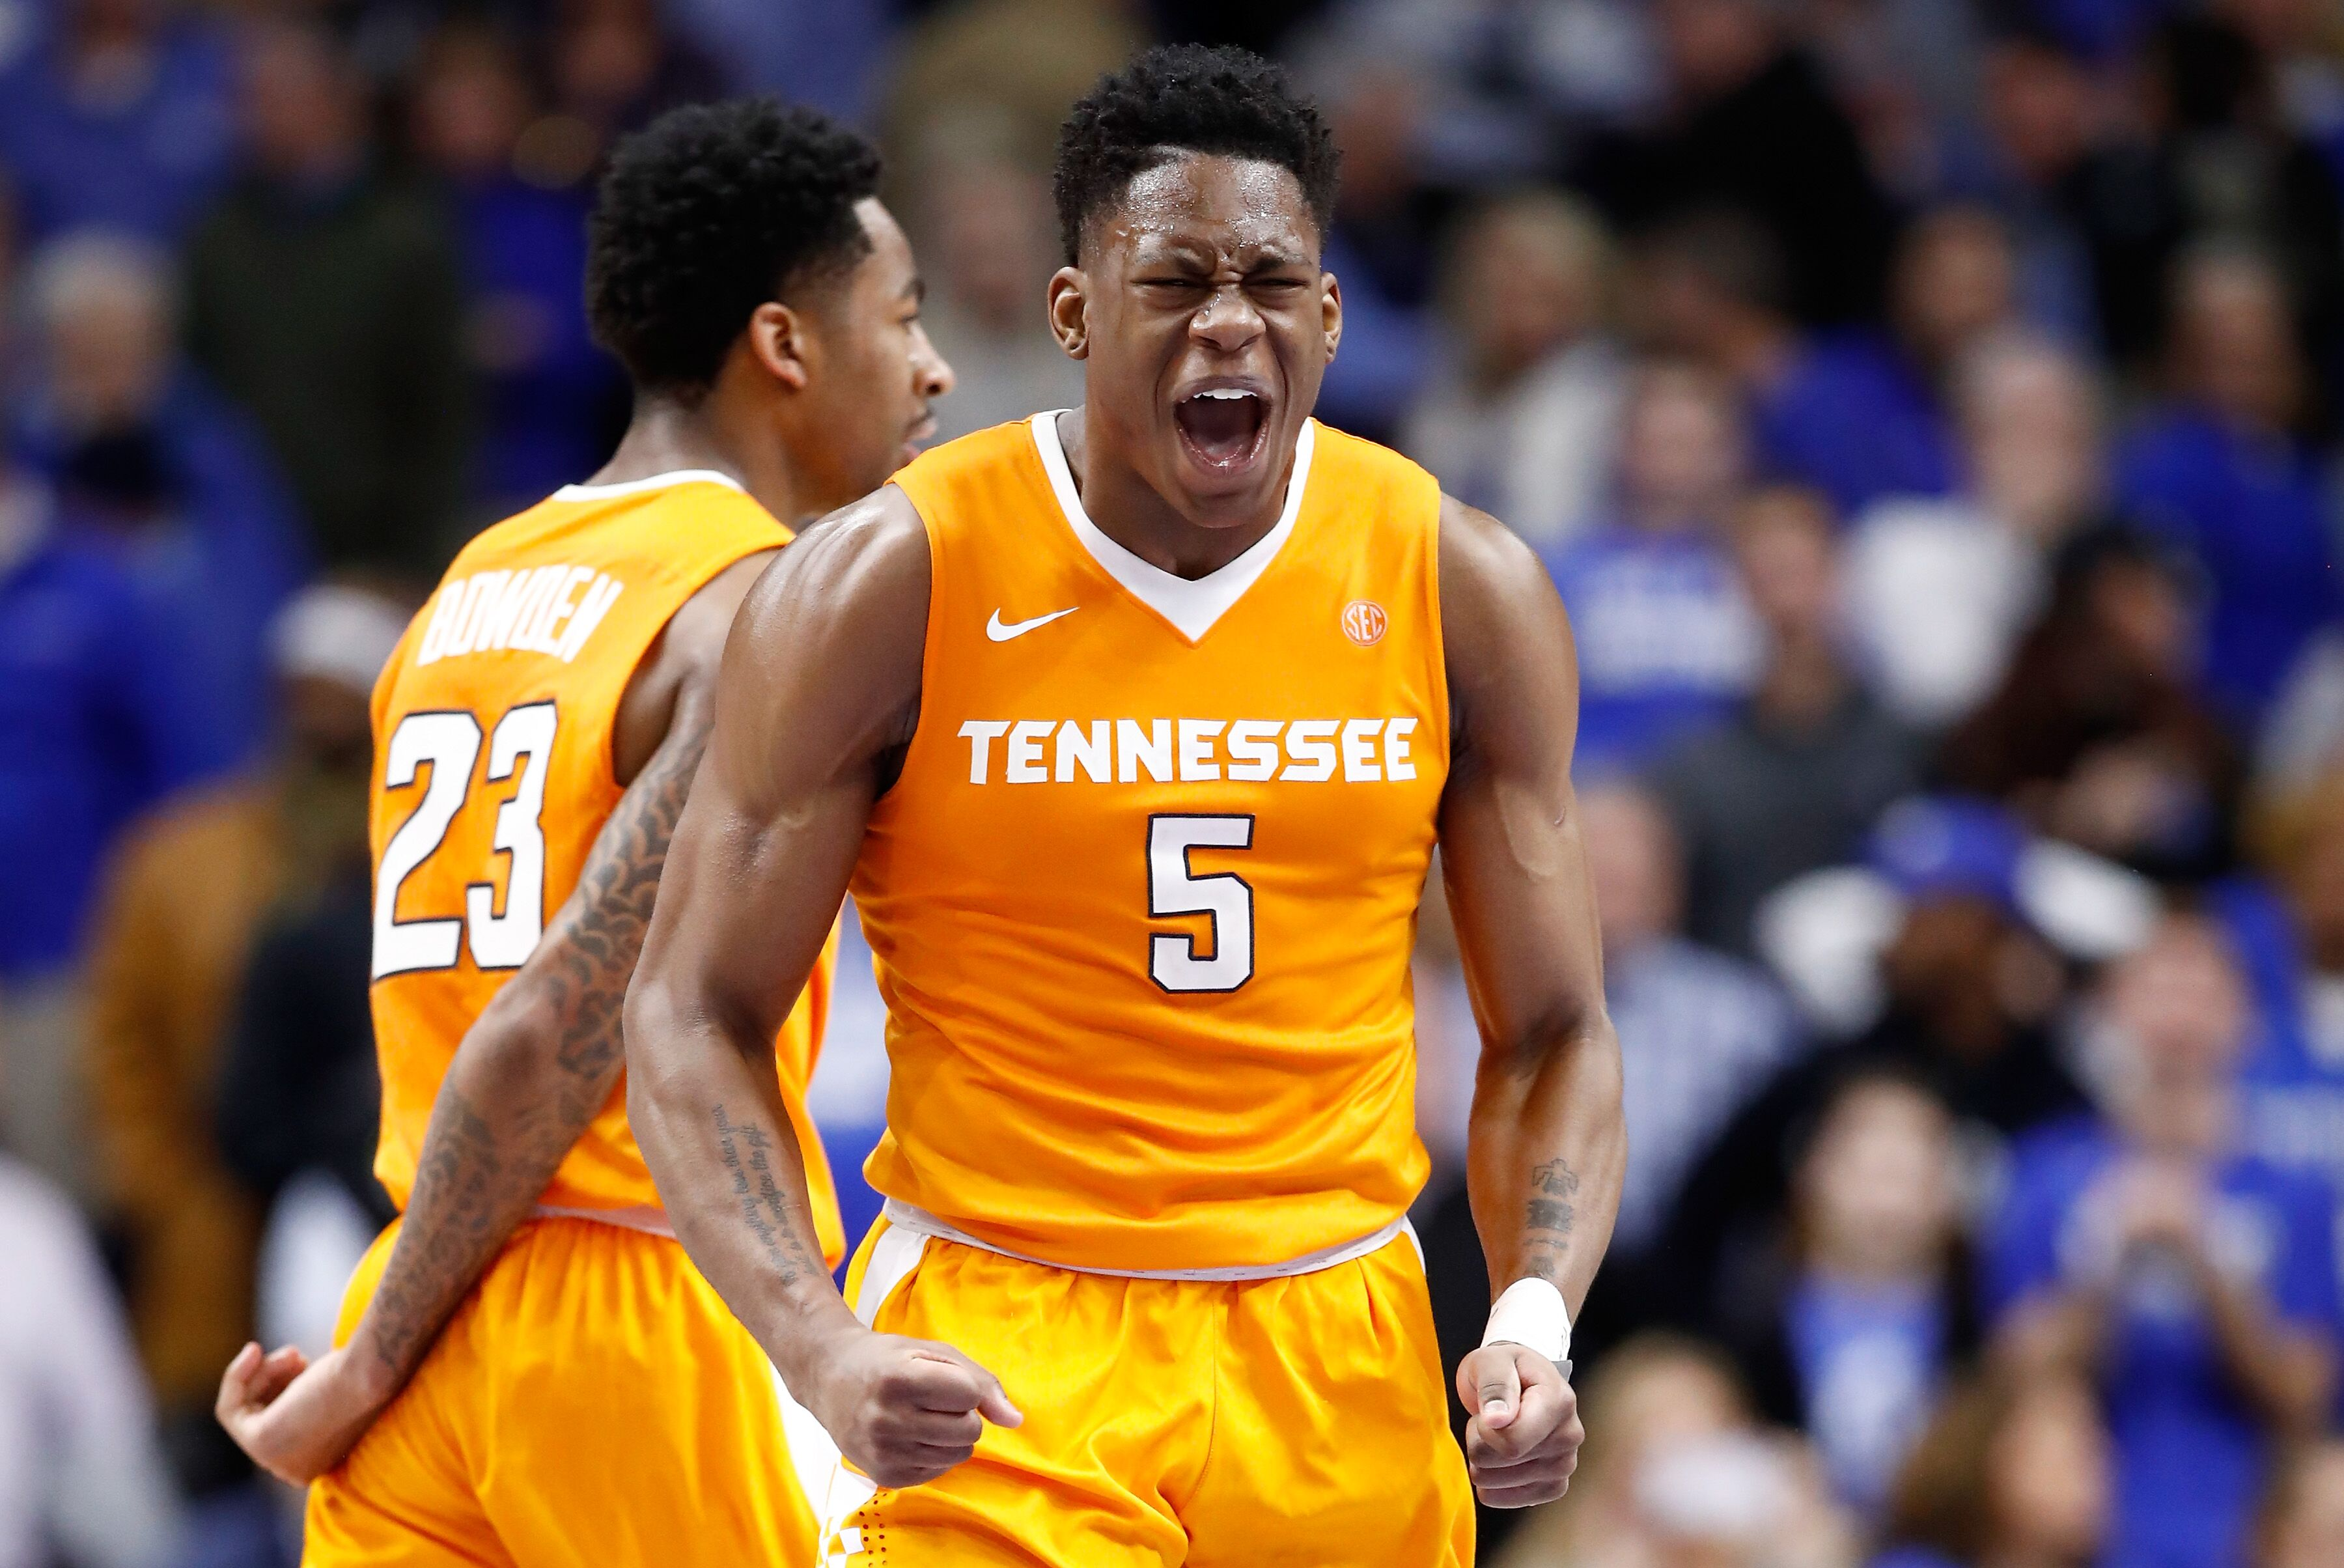 Uk Basketball: NCAA Tournament 2018, Wright St. Vs Tennessee: Watch